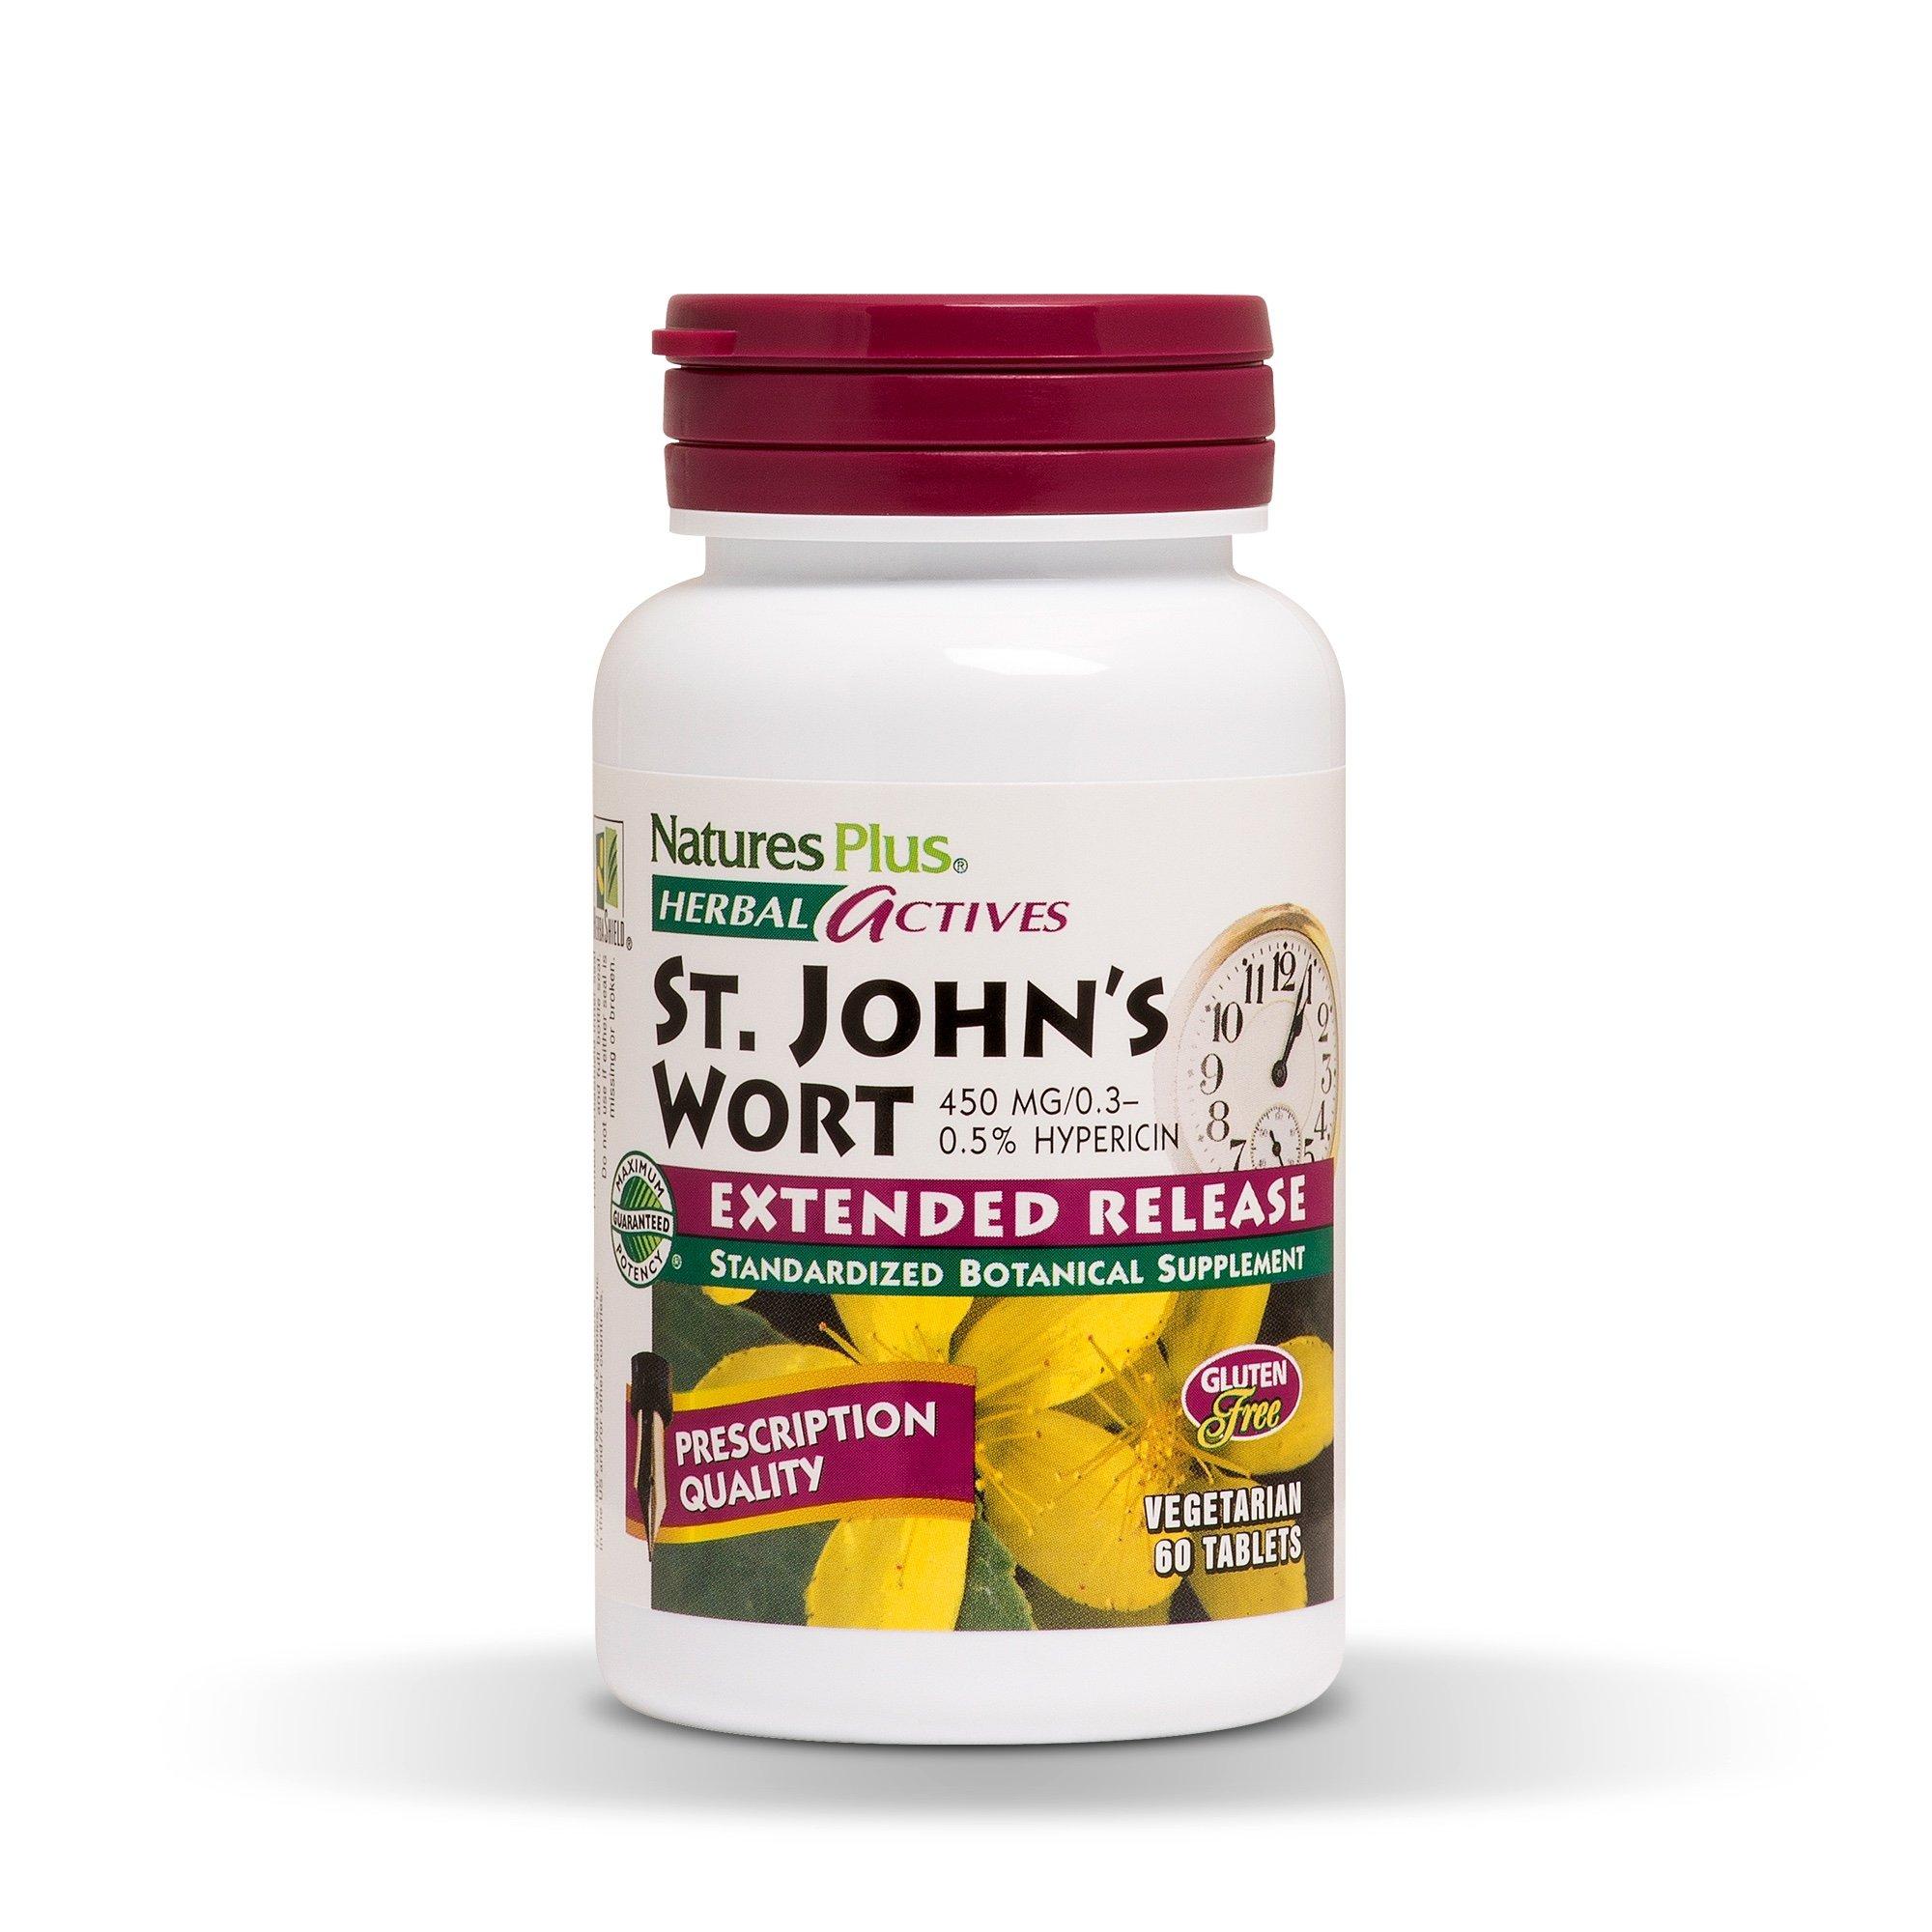 Natures Plus Herbal Actives St John's Wort - 450 mg, 60 Vegan Tablets, Extended Release - Natural Mood Enhancer Supplement - Vegetarian, Gluten Free - 60 Servings